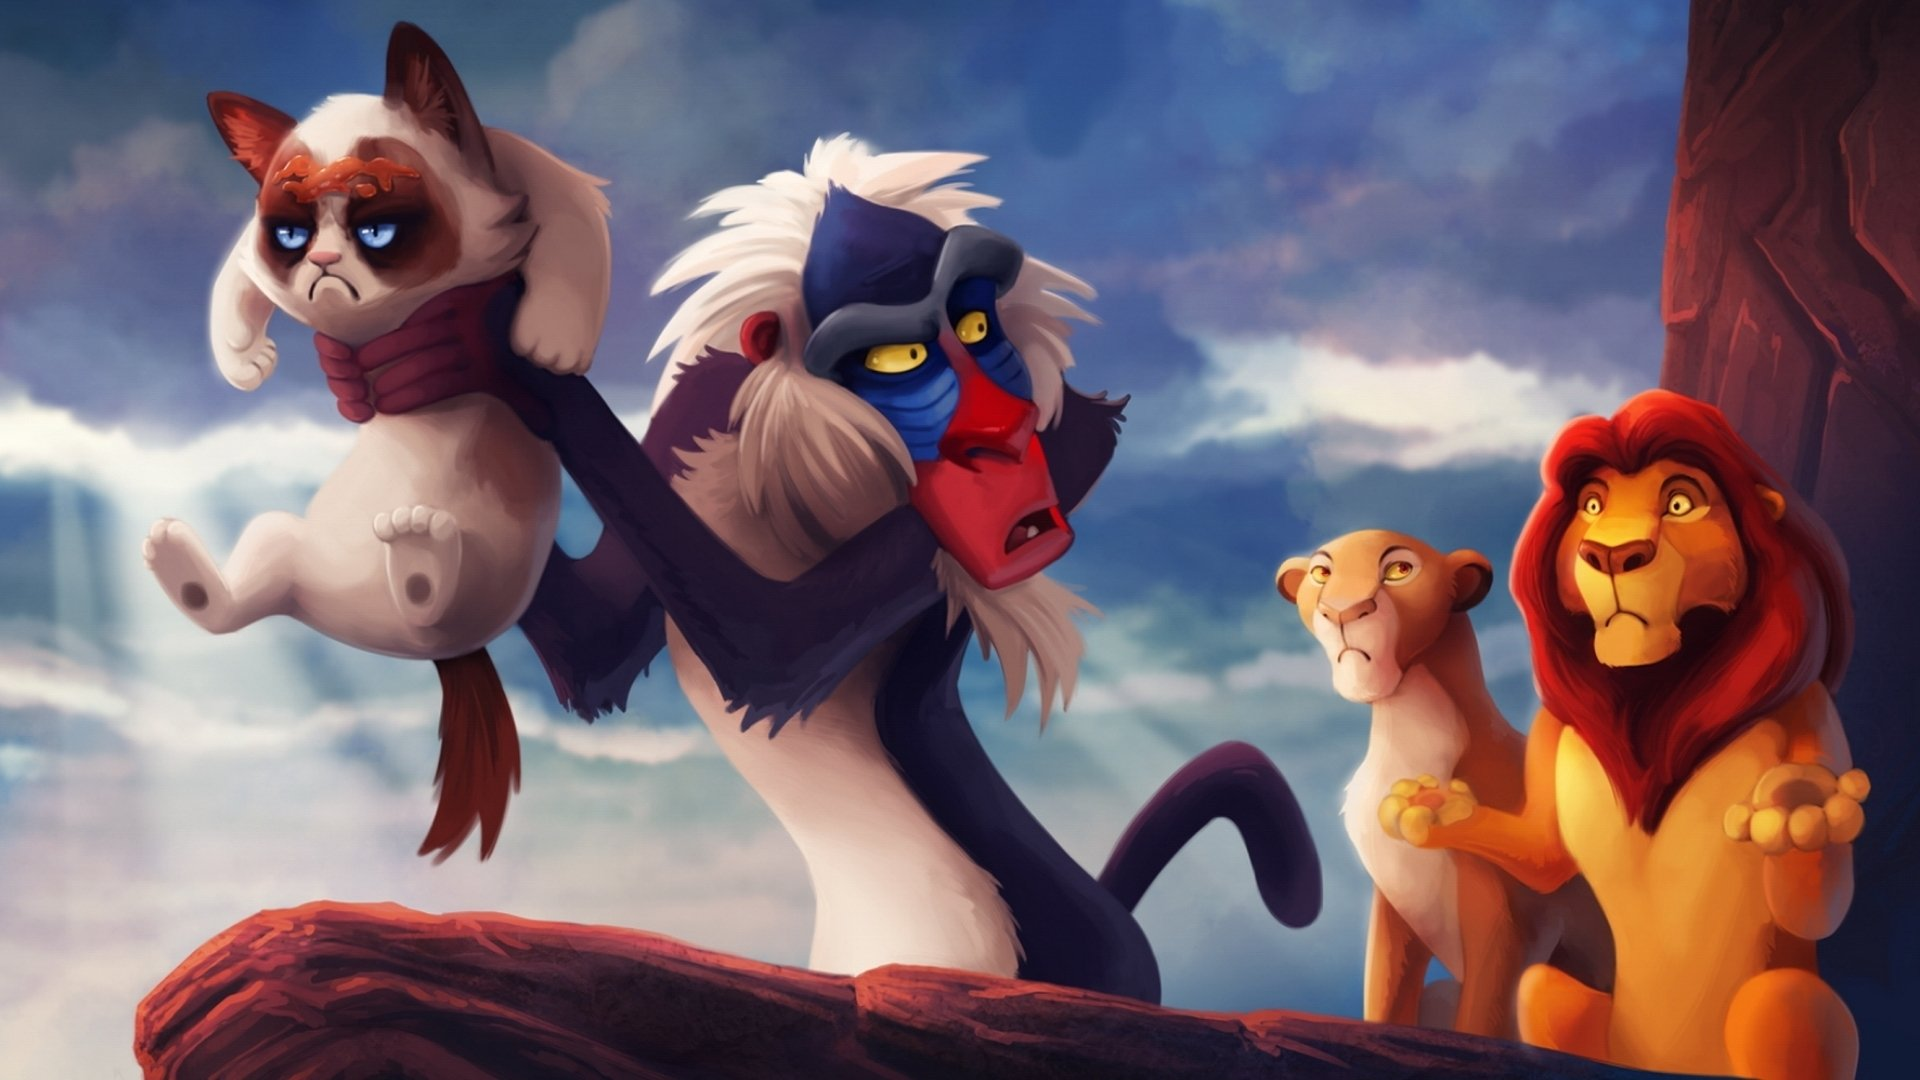 The Lion King Cartoons Monkey Wallpaper 1920x1080 309985 Wallpaperup